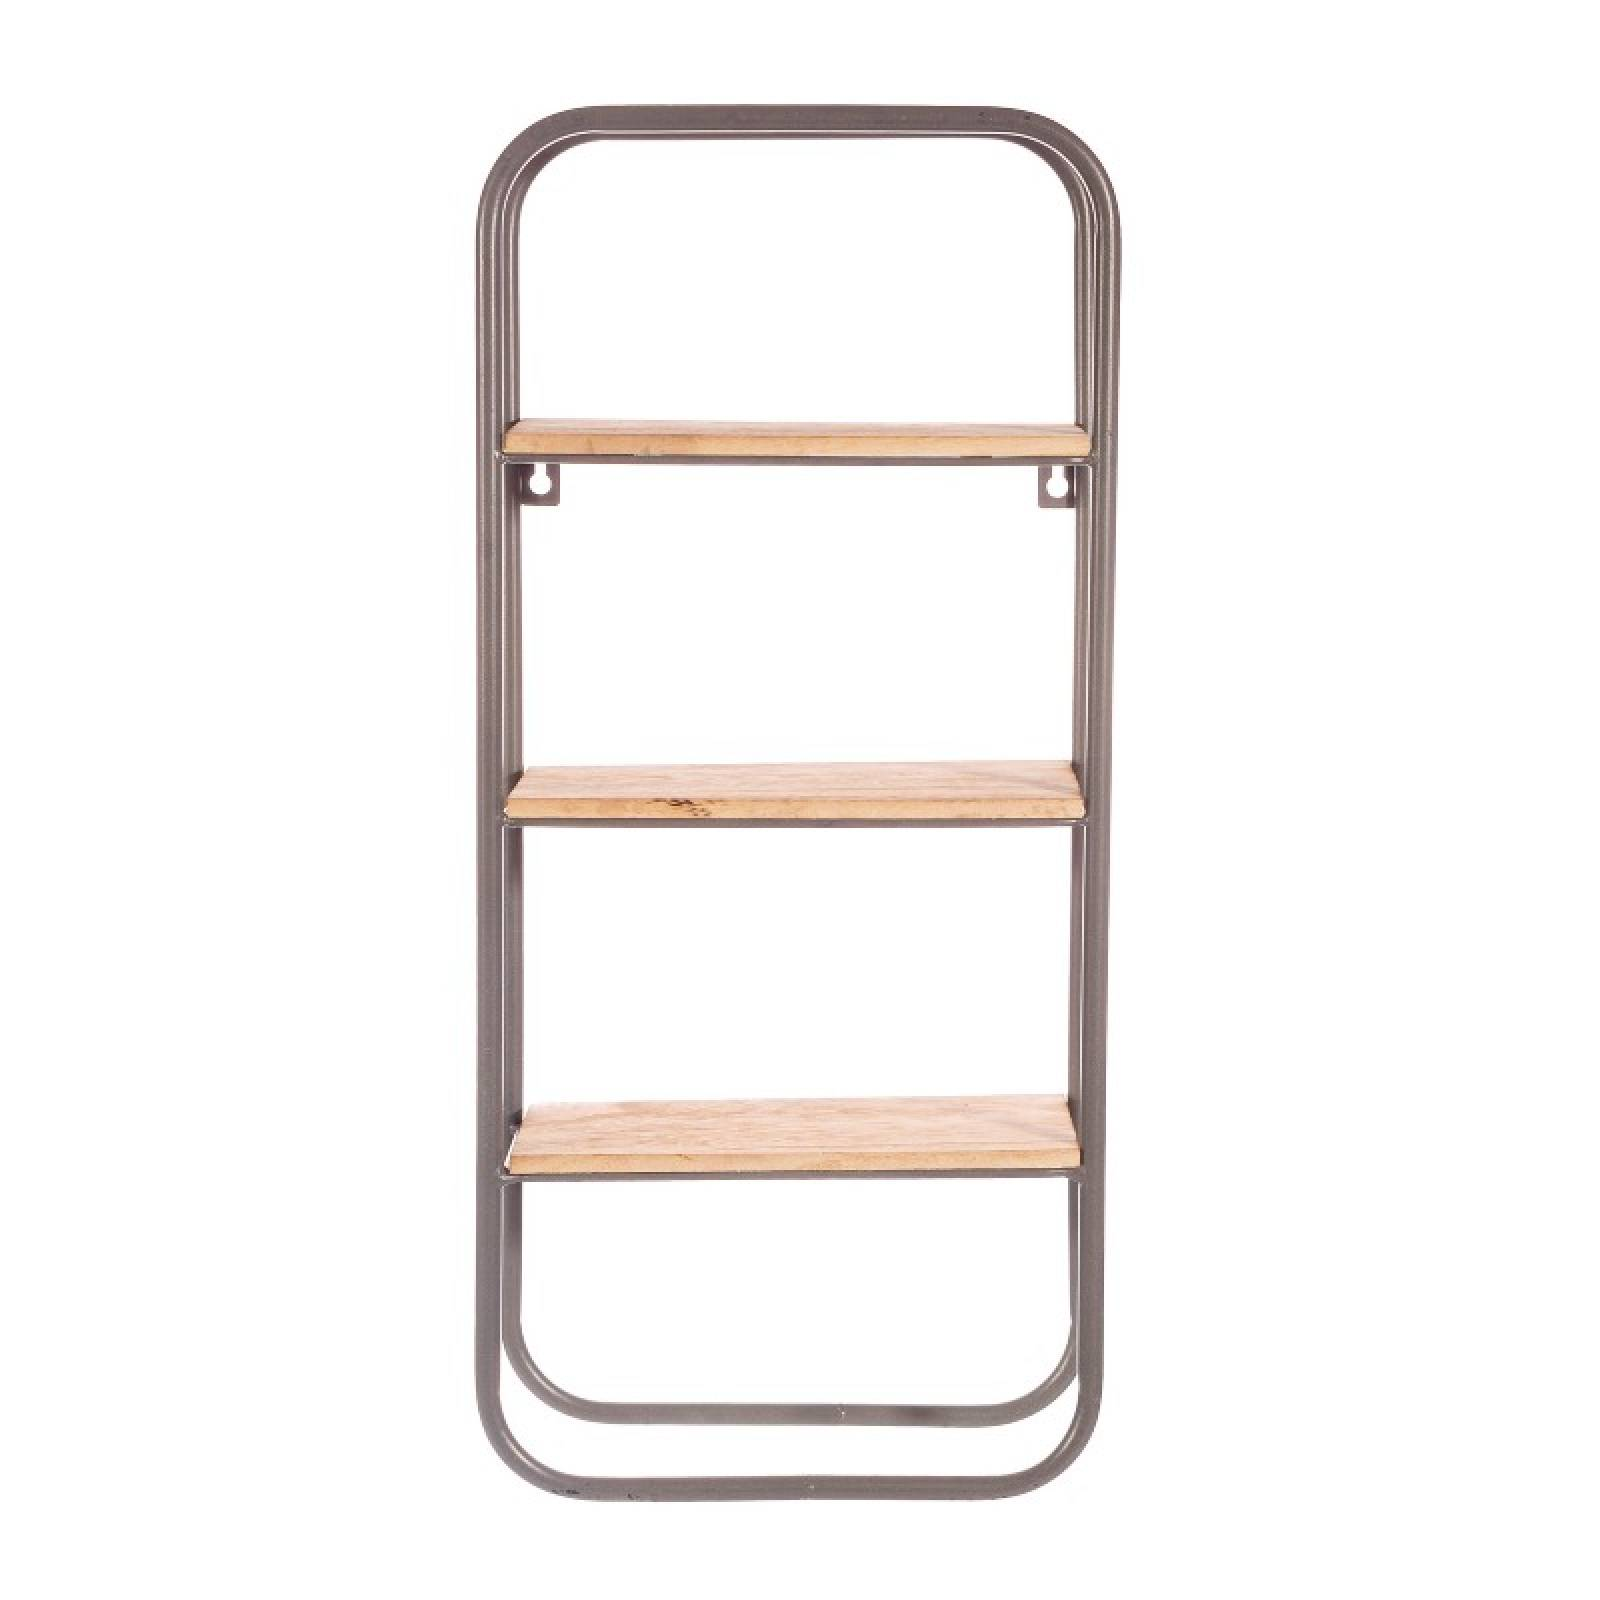 Small Grey Metal & Wood Wall Mounting Shelf Unit thumbnails